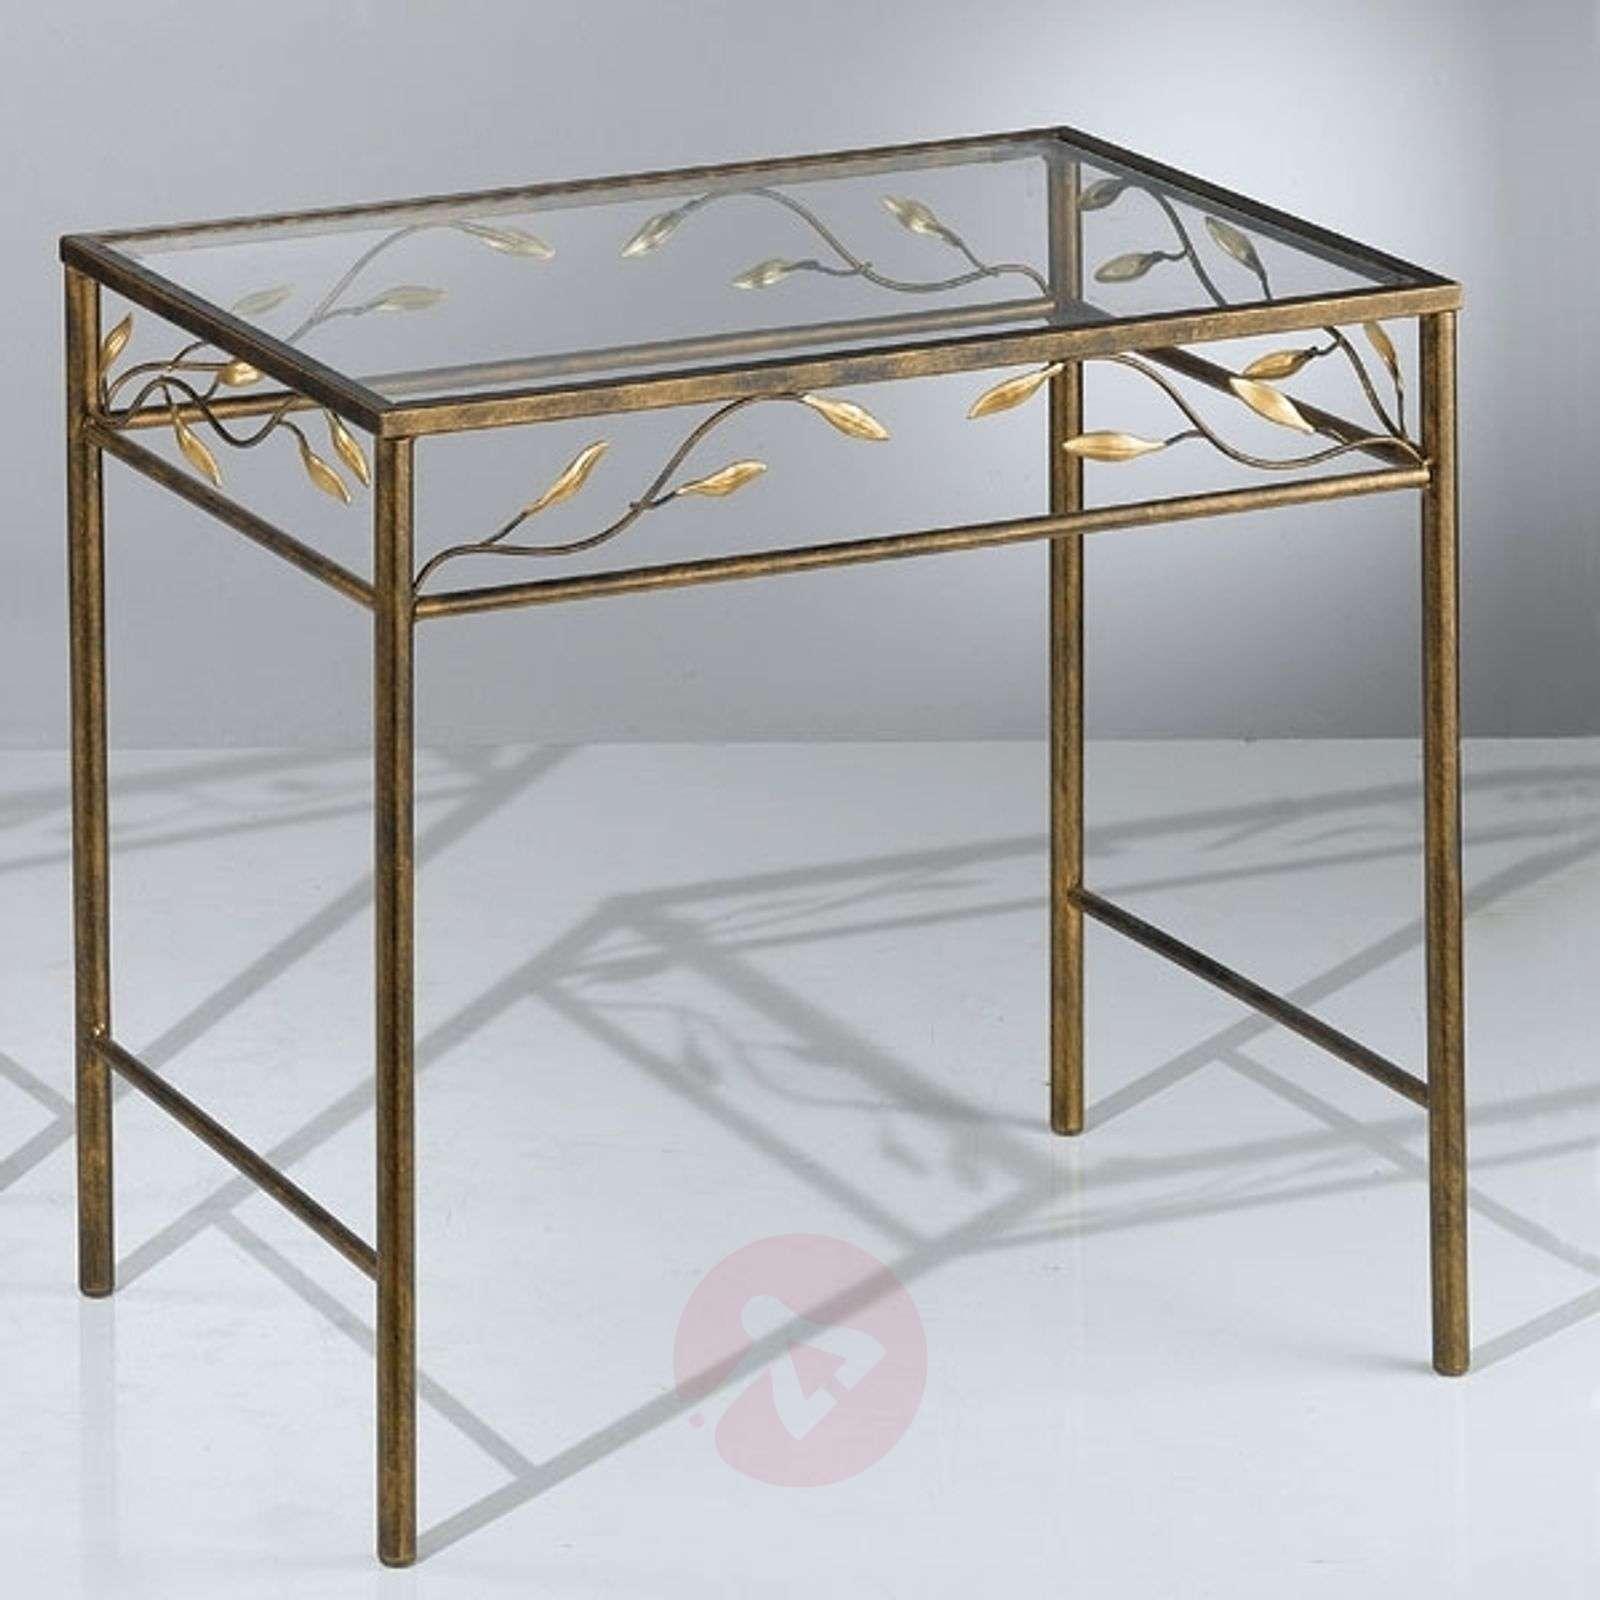 Table CAMPANA 54x35cm-5505317-01